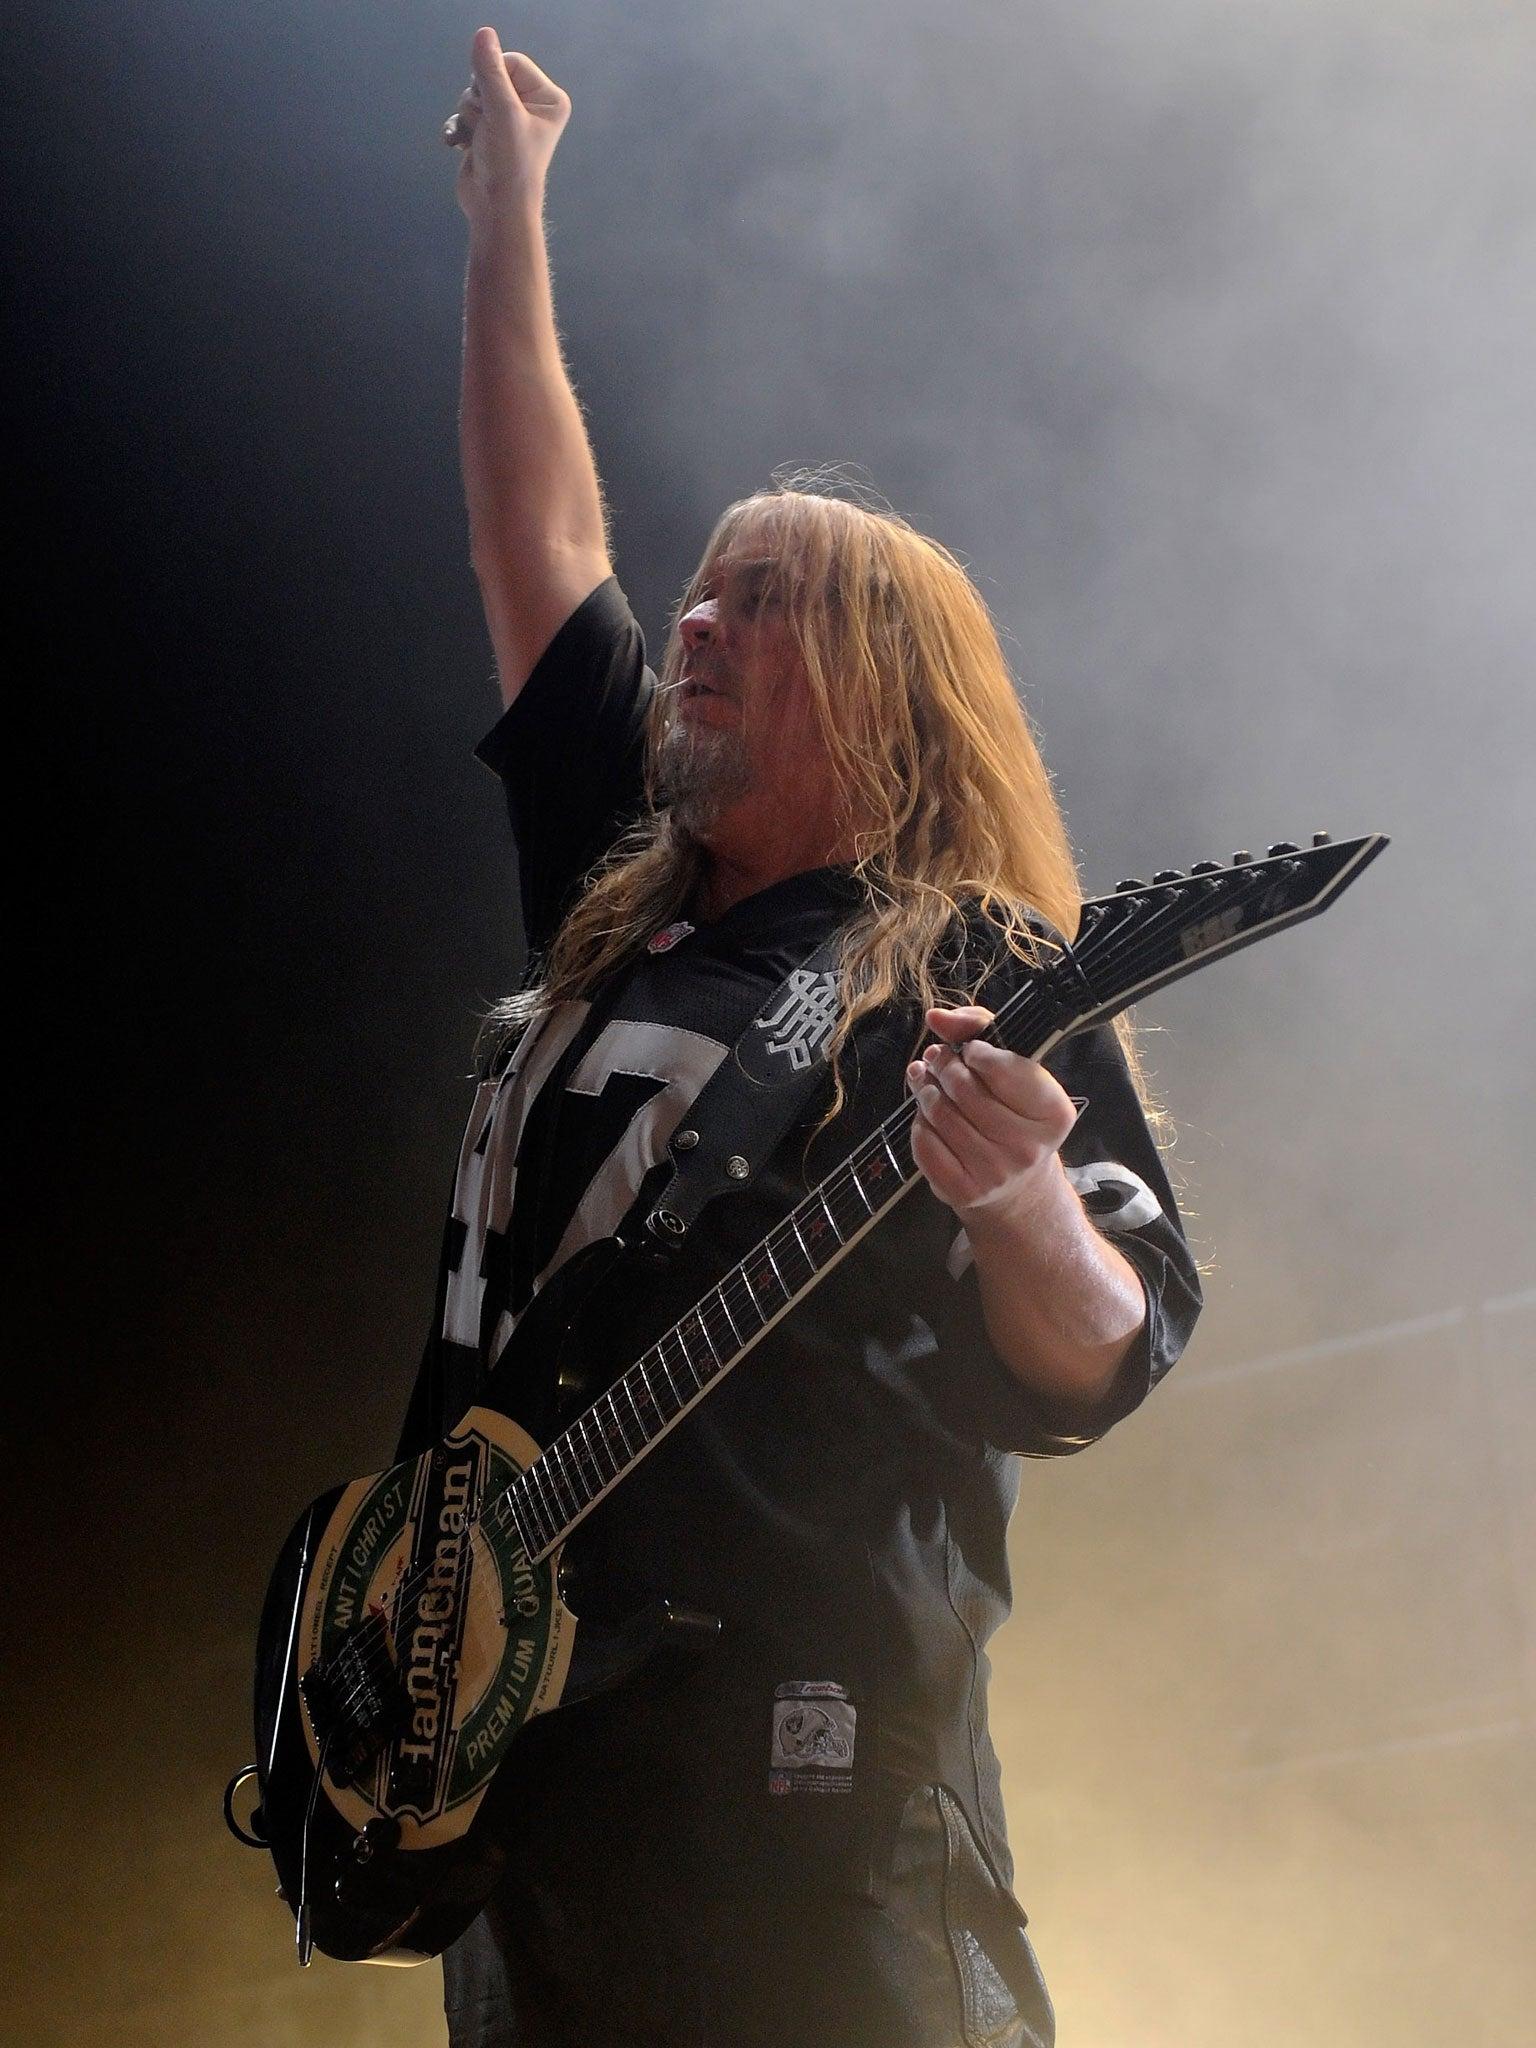 slayer guitarist jeff hanneman died of alcohol